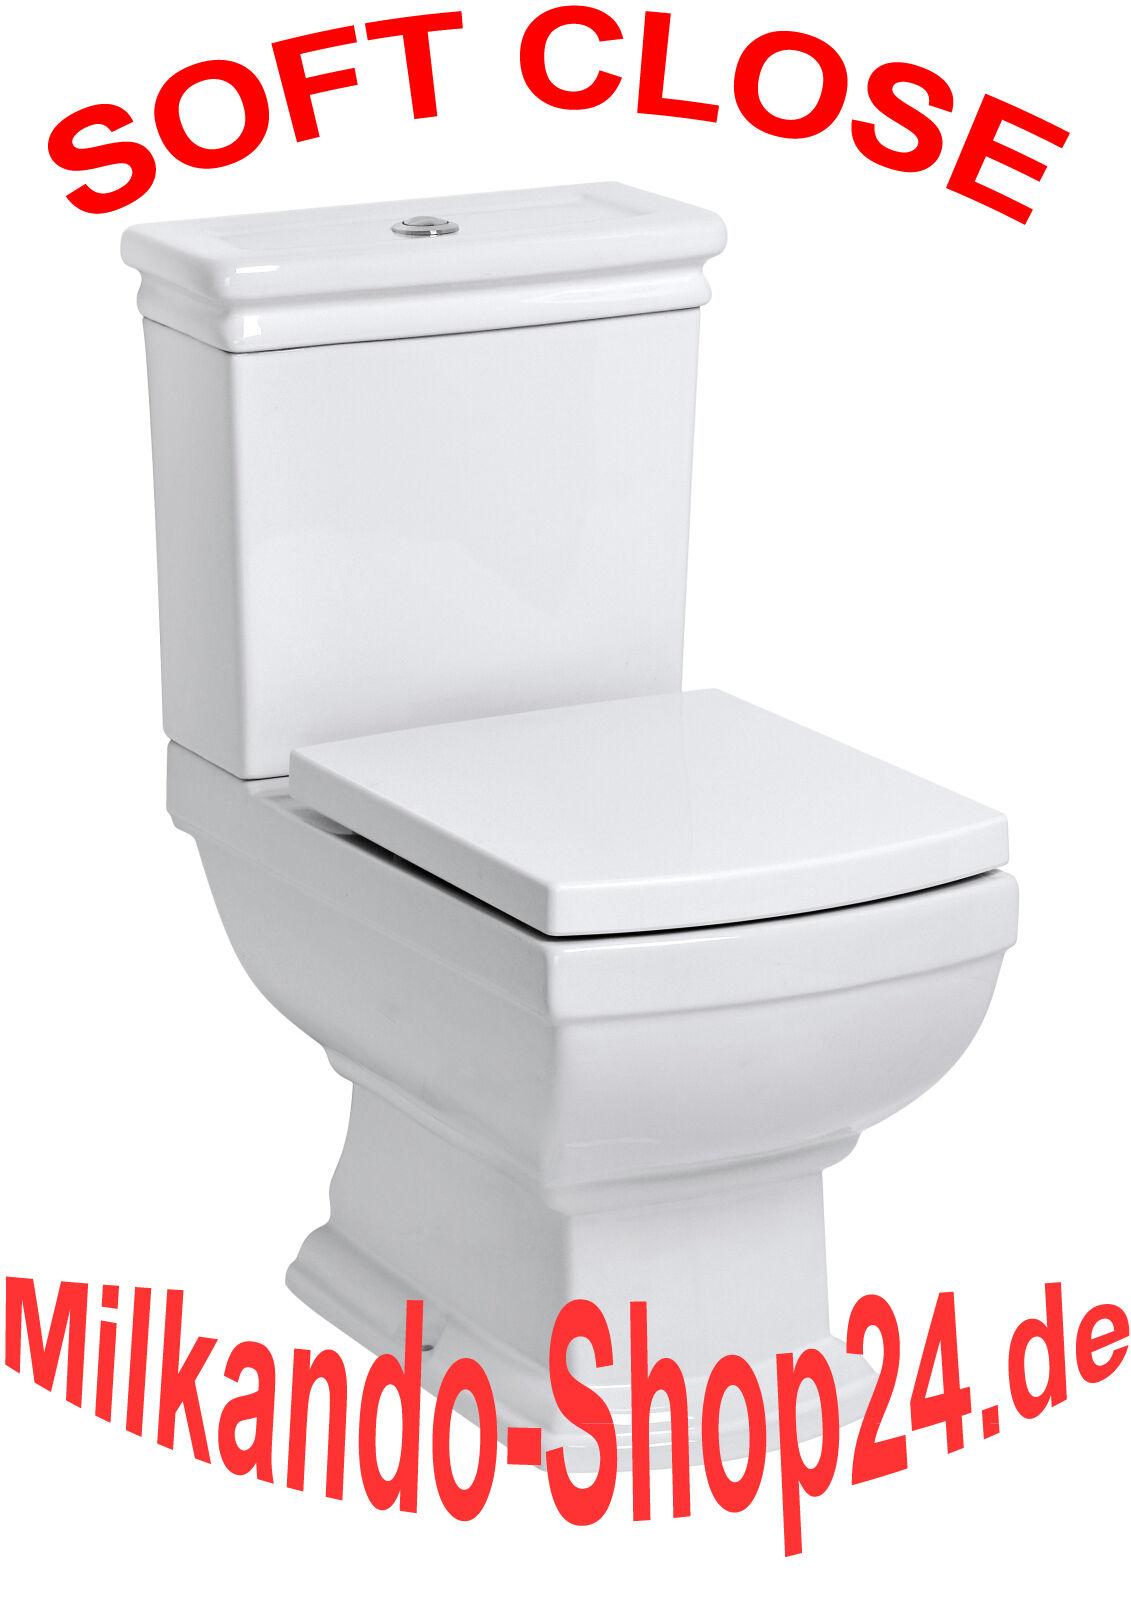 nostalgie retro classic wc toilette stand komplett set mit. Black Bedroom Furniture Sets. Home Design Ideas